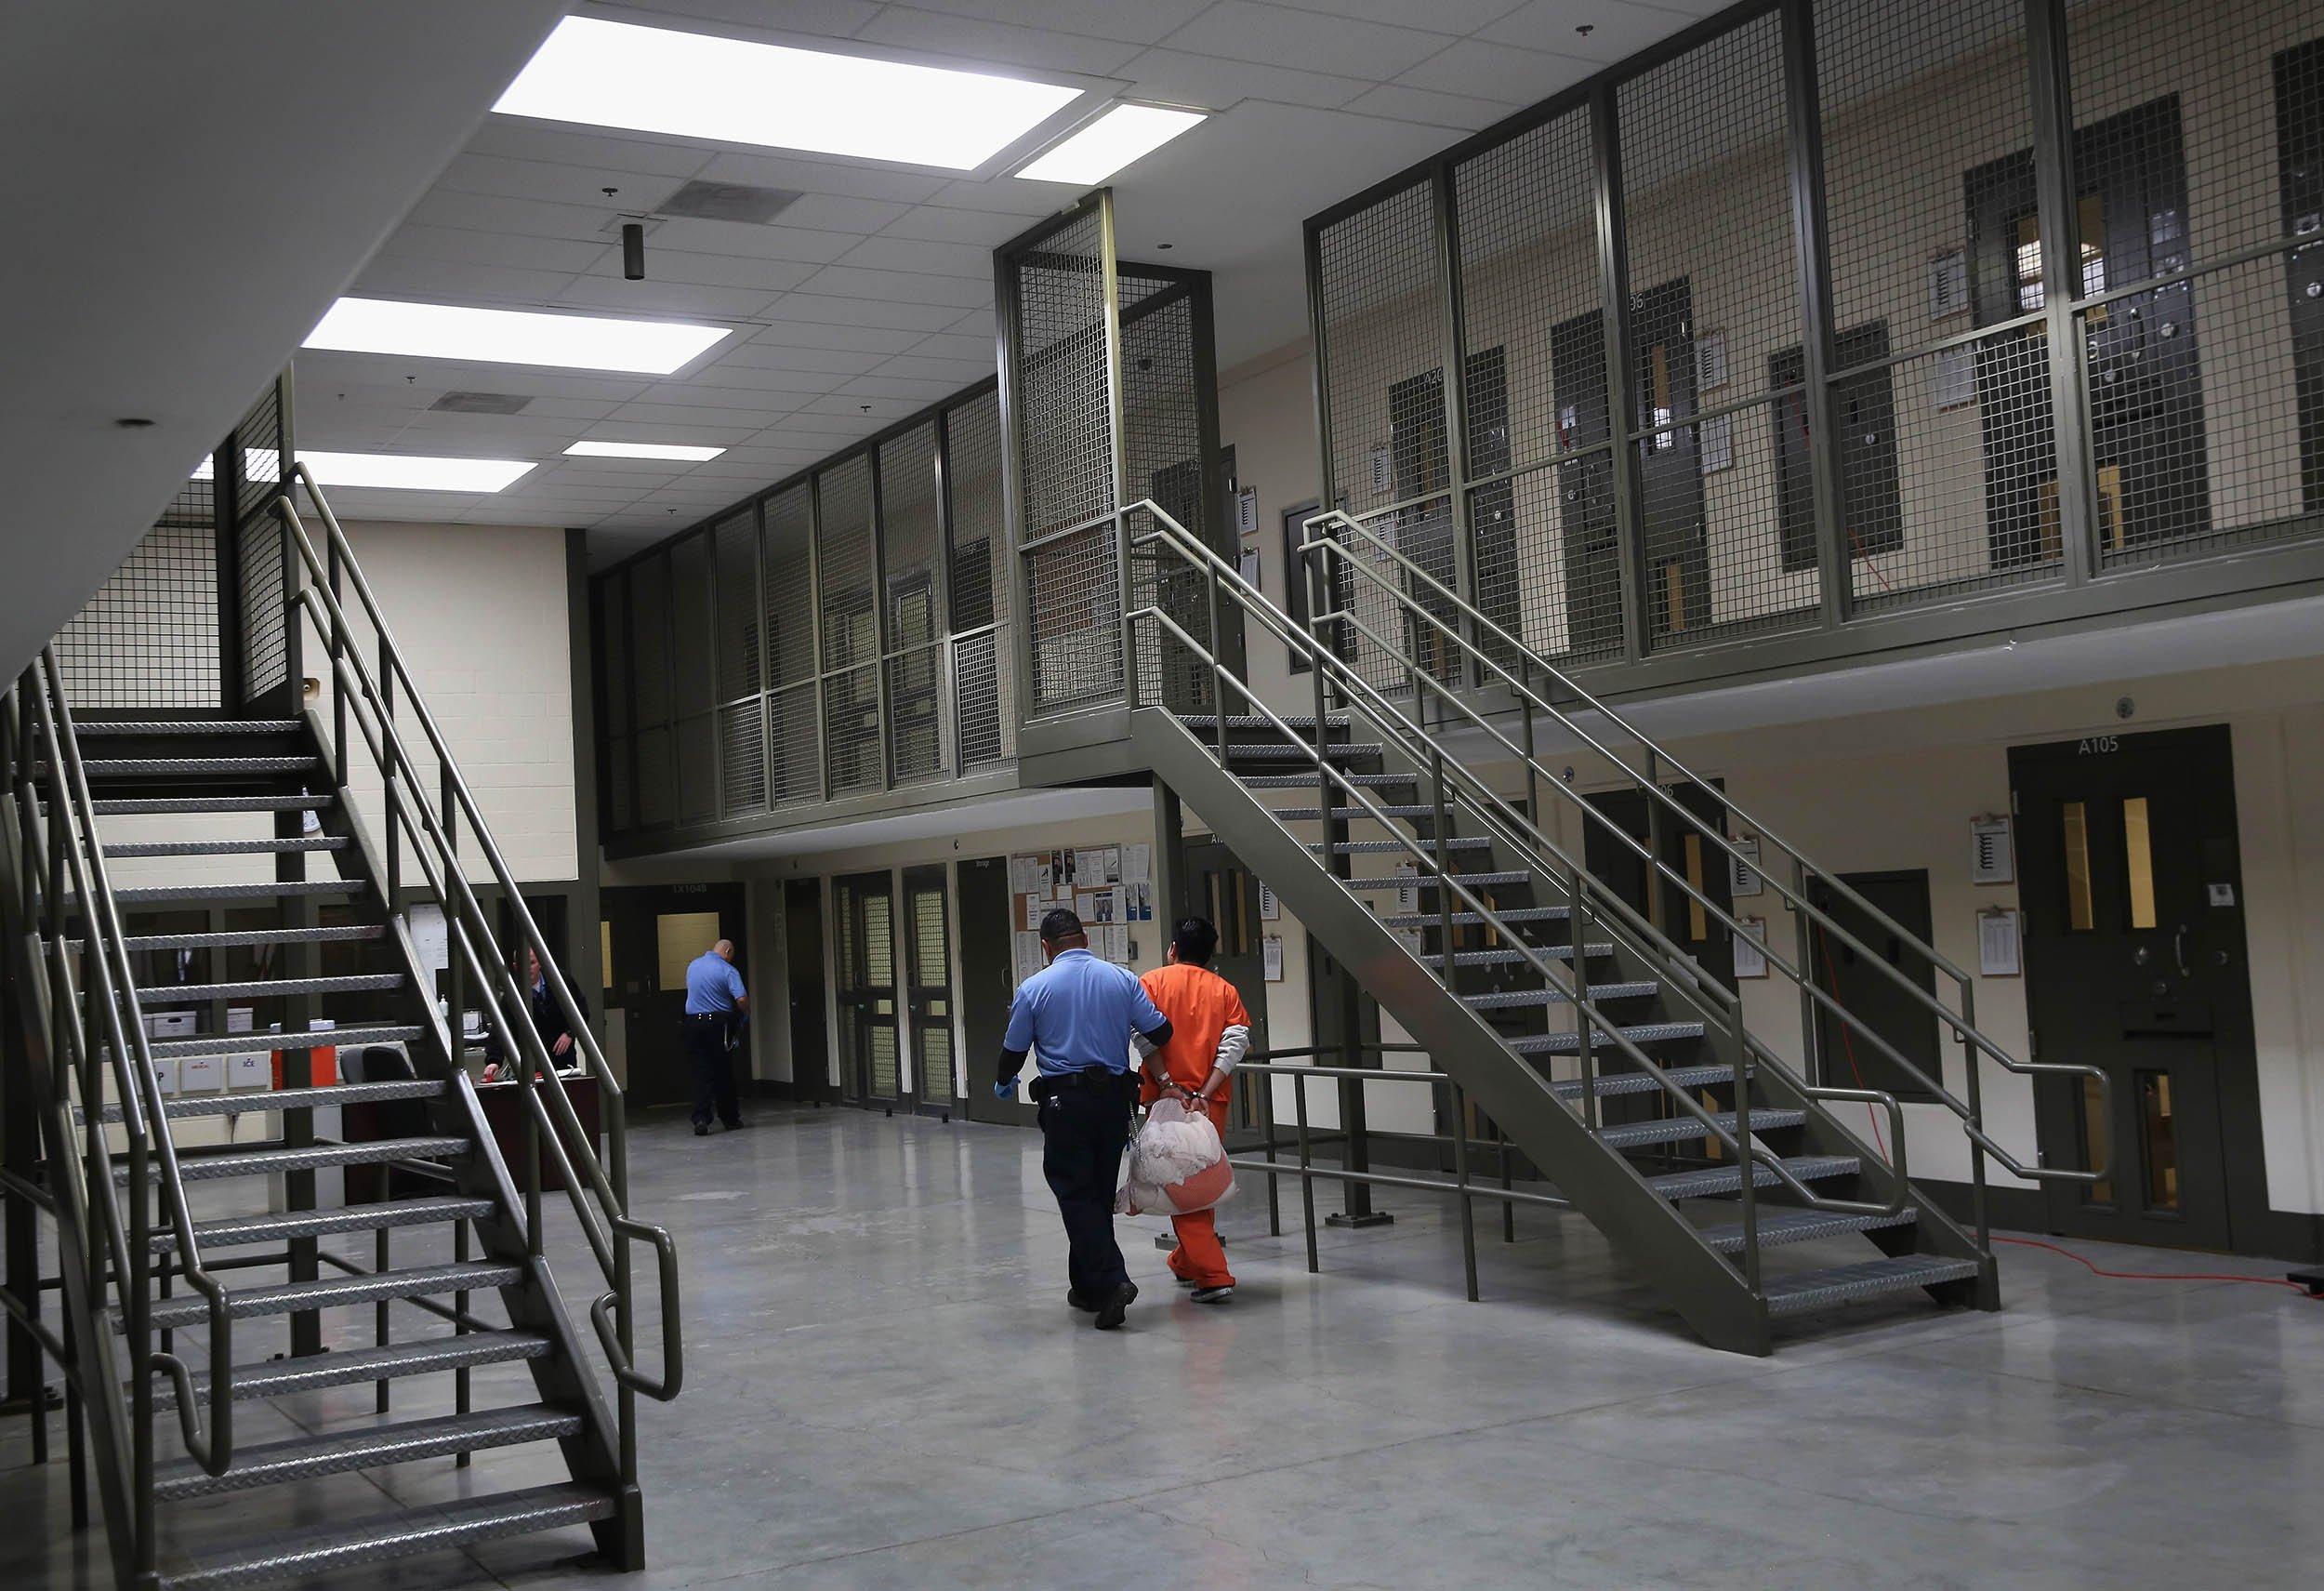 12_19_Inmates